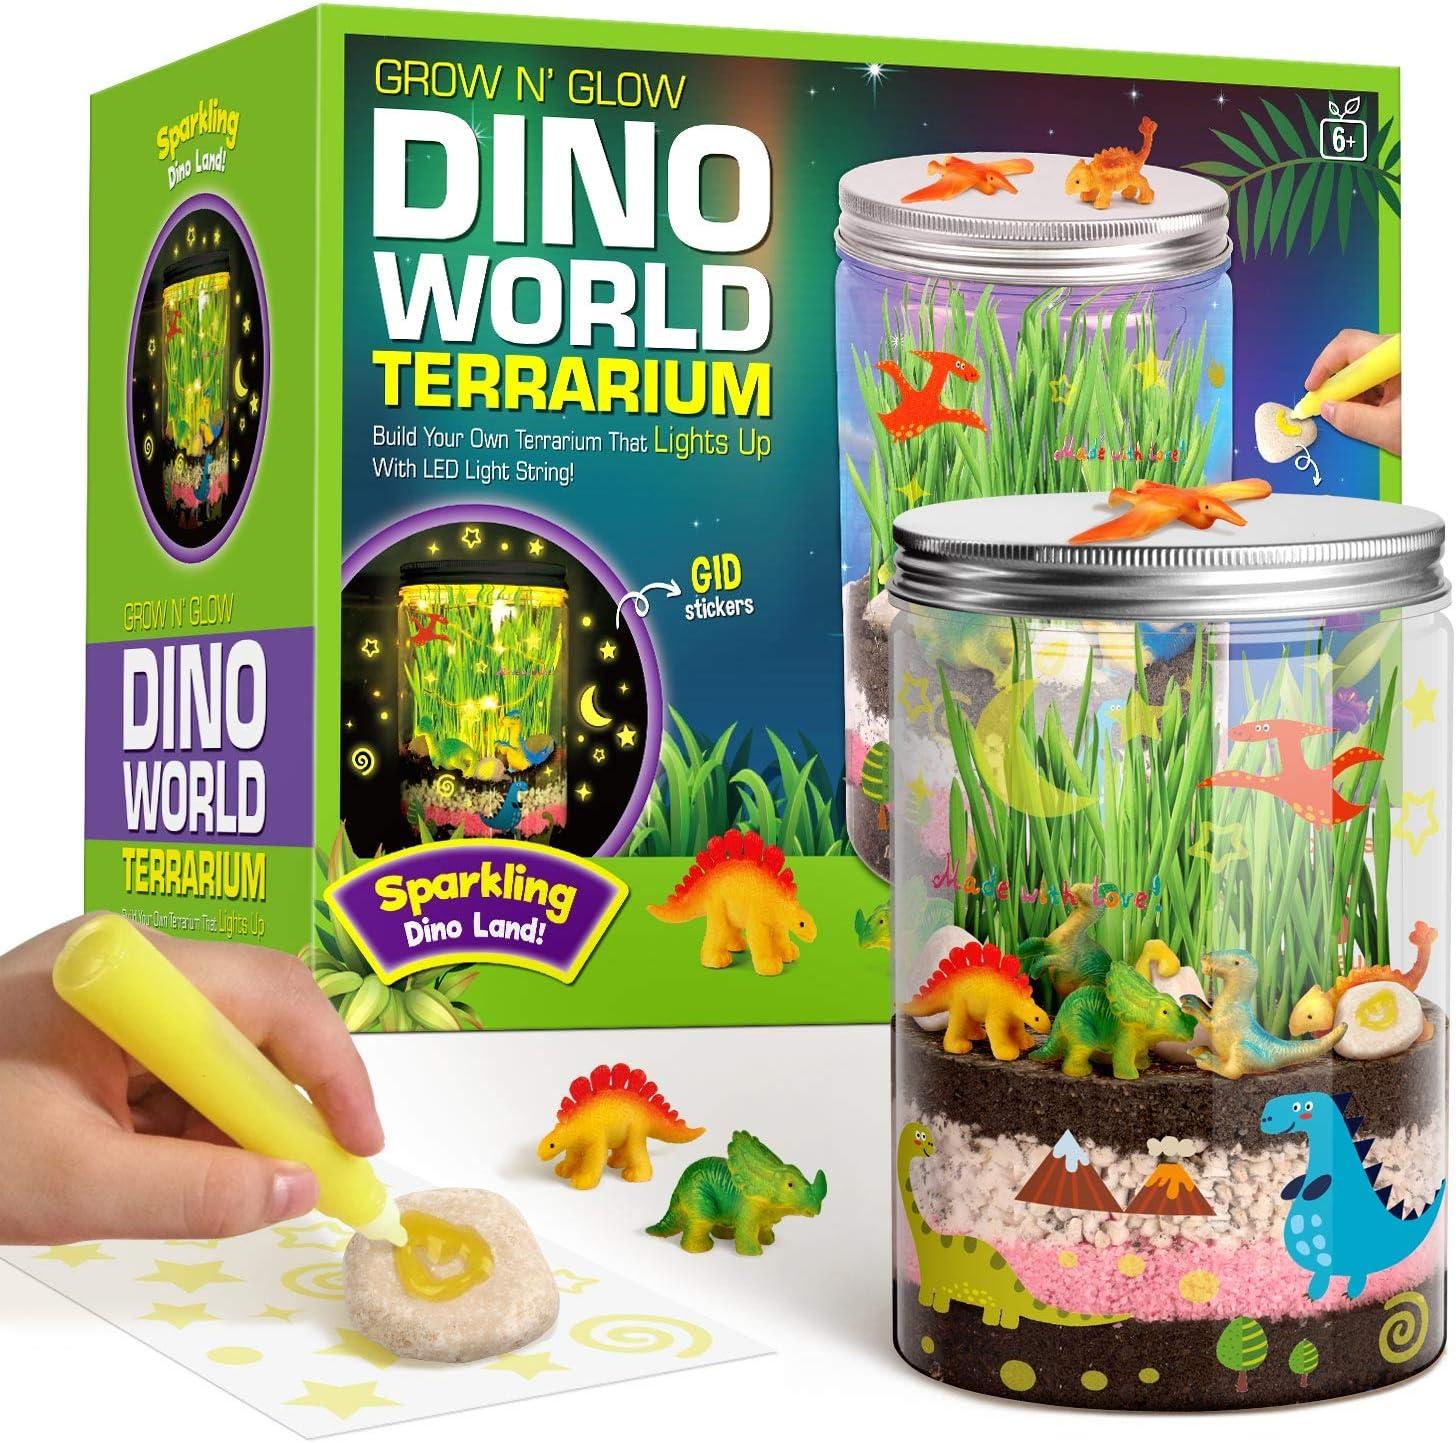 XXTOYS Light-up Dino World Terrarium Kit for Kids - Dinosaur Toys - Create Your Own Mini Dinosaur Garden in a Jar Glows at Night - Science Kits – Gardening Kit, Creativity Gifts for Boys & Girls